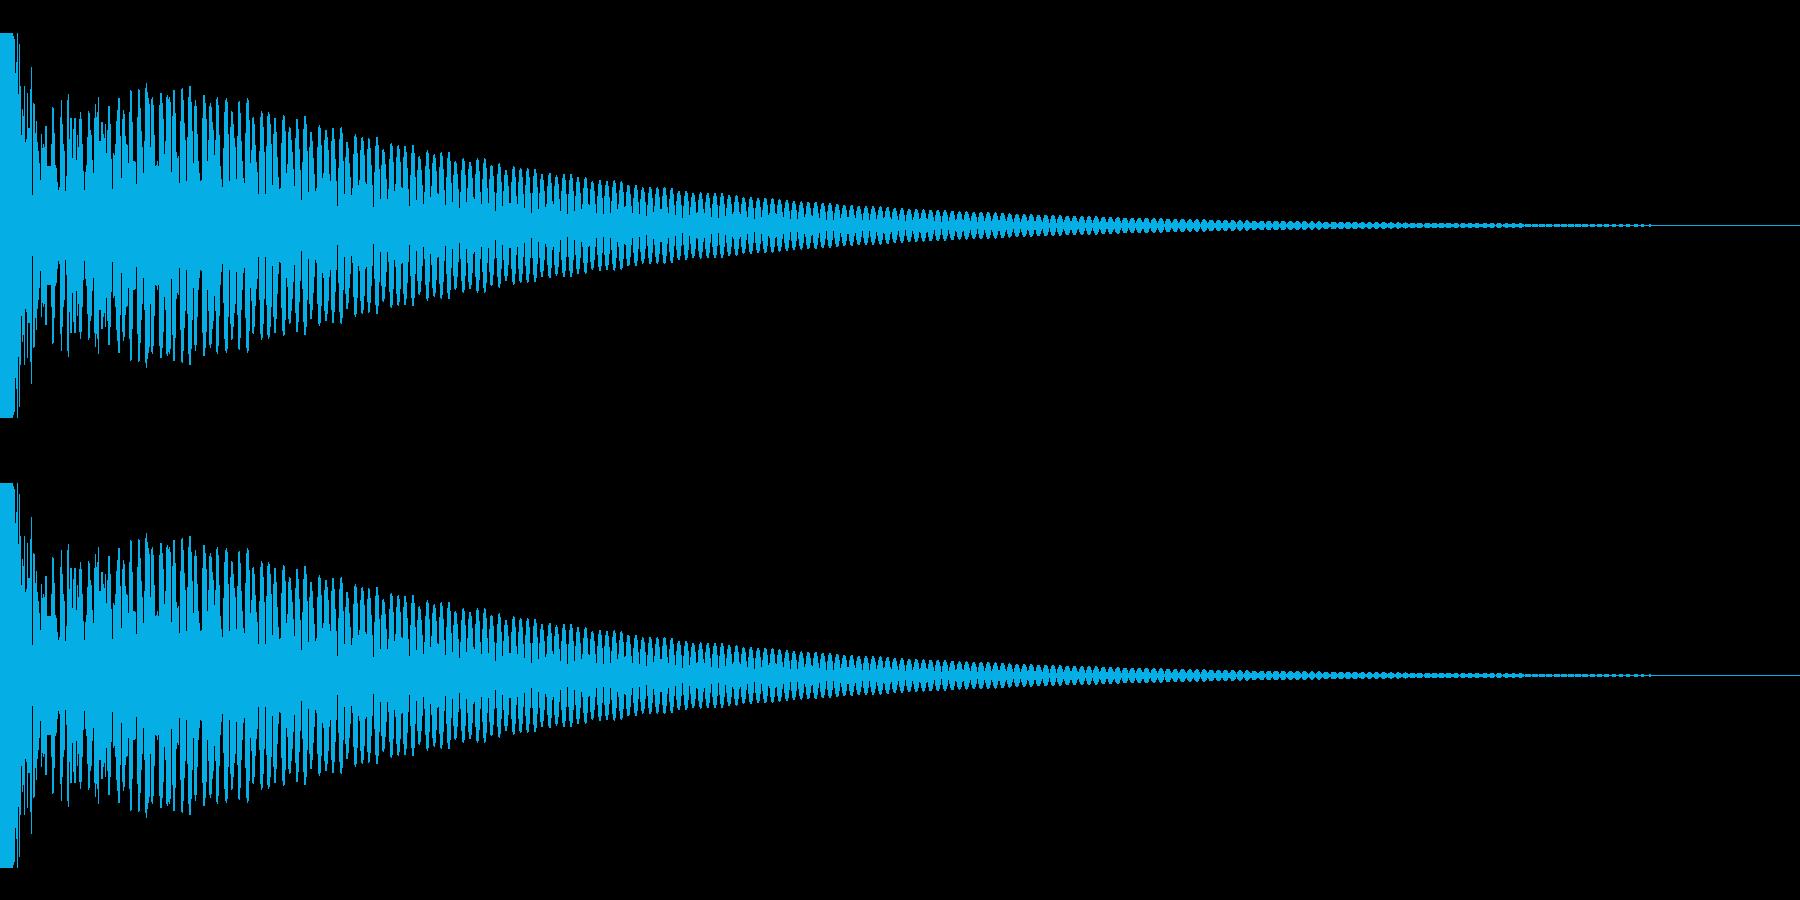 DTM Tom 21 オリジナル音源の再生済みの波形